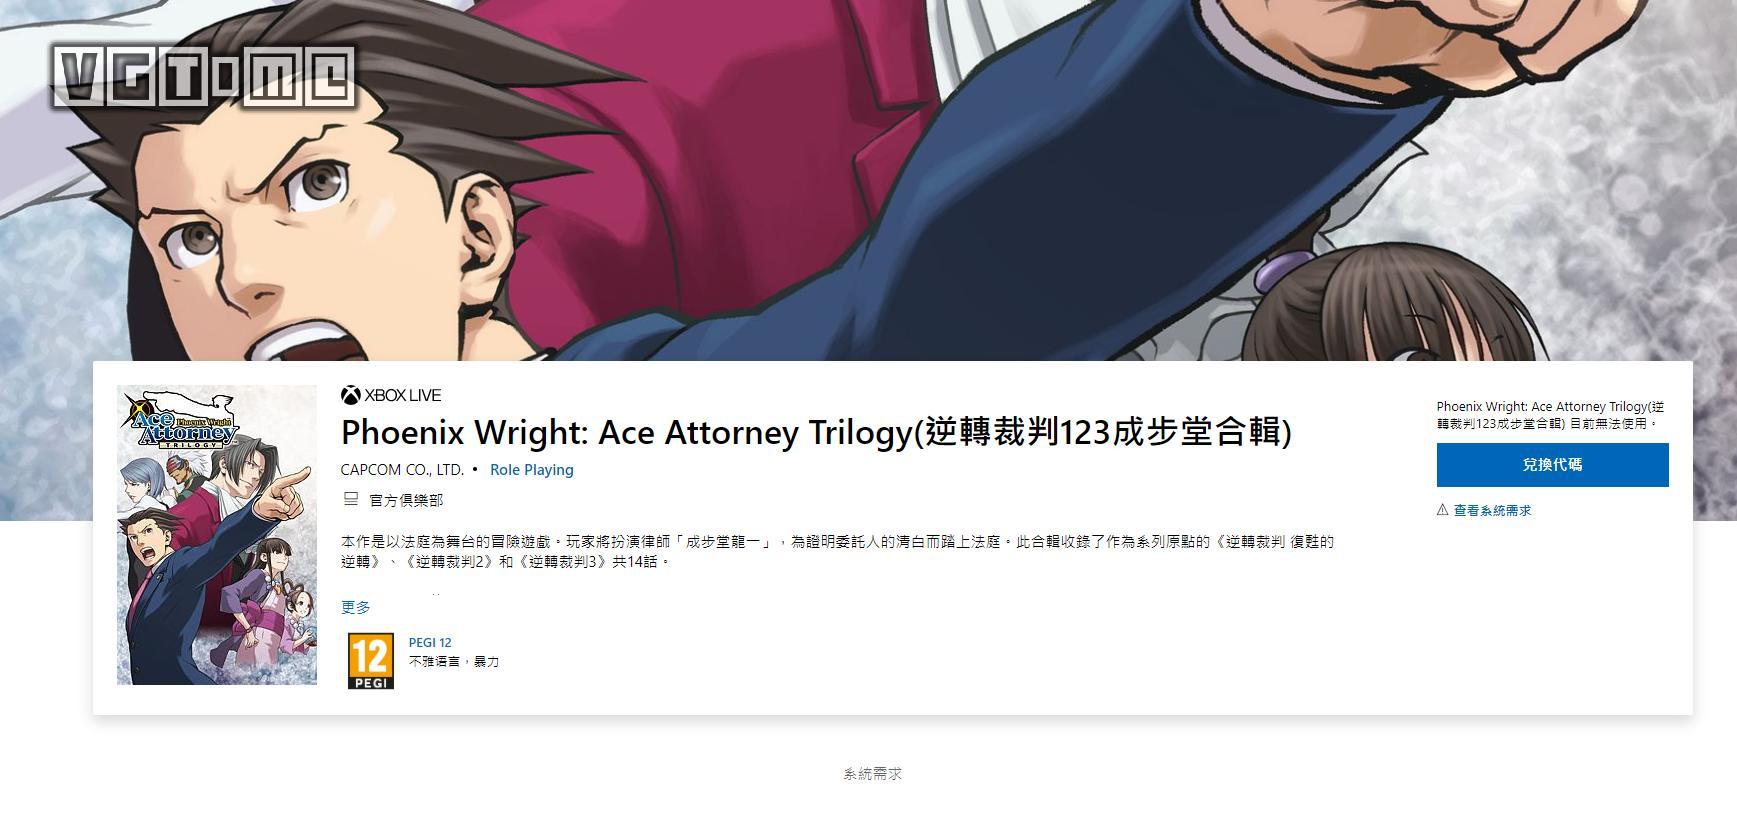 Xbox《逆转裁判123 成步堂选集》将通过更新补丁增加中文字幕